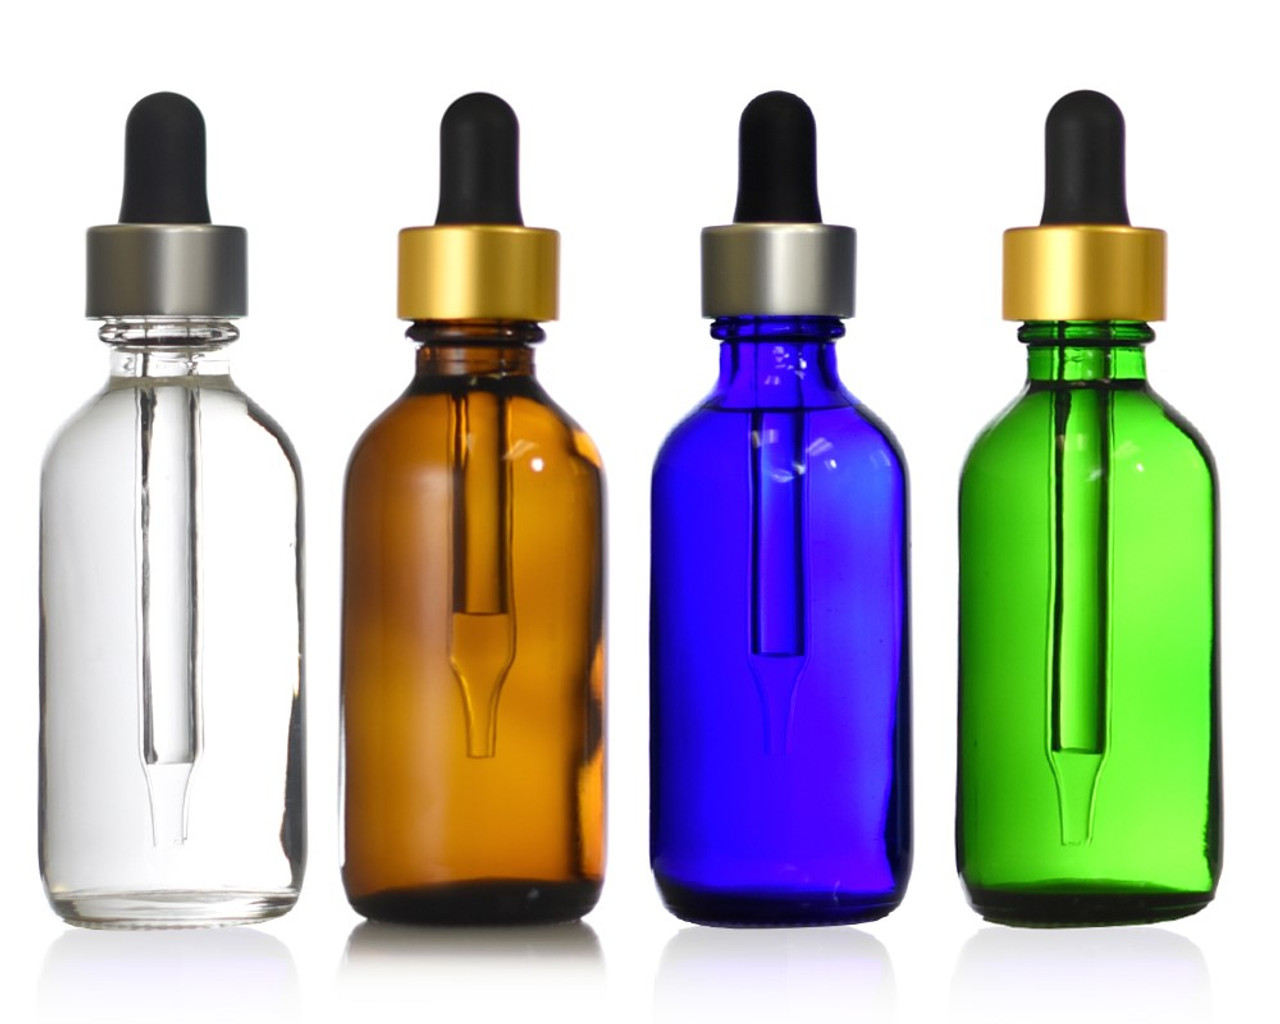 2 oz (60 ml) Boston Round Bottles W/ Metallic Glass Dropper